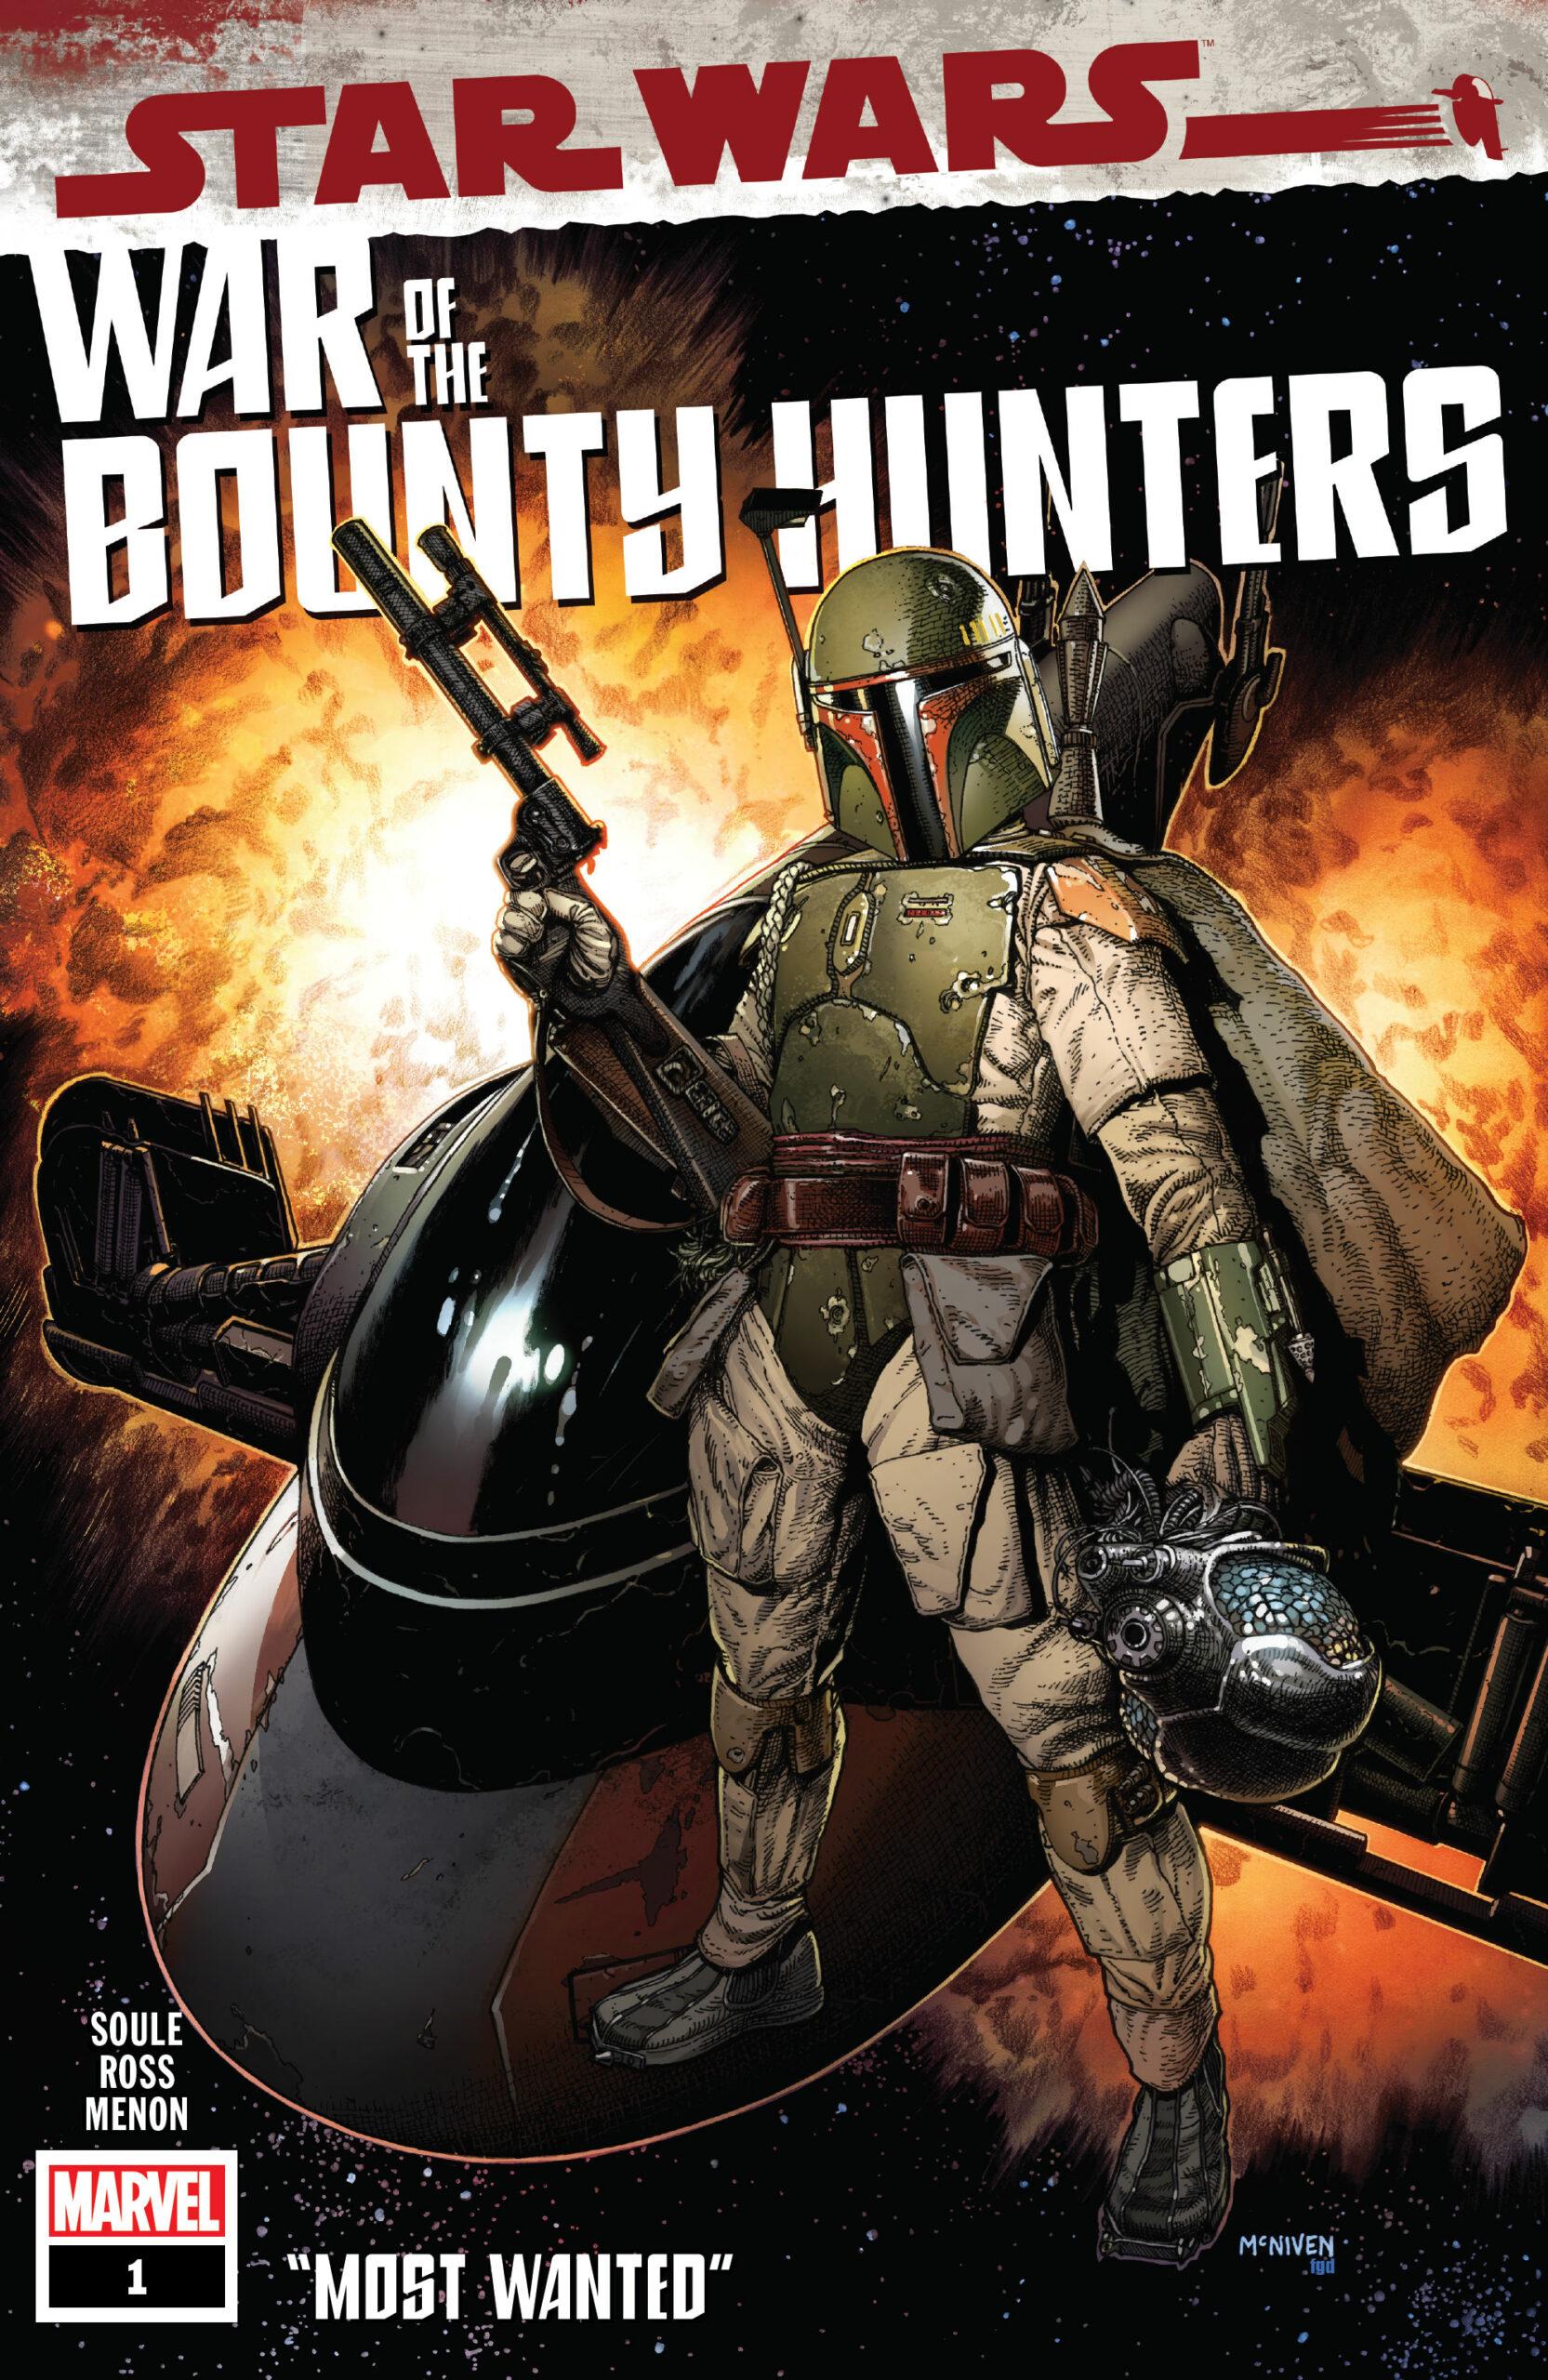 Charles Soule's War of the Bounty Hunters comic books